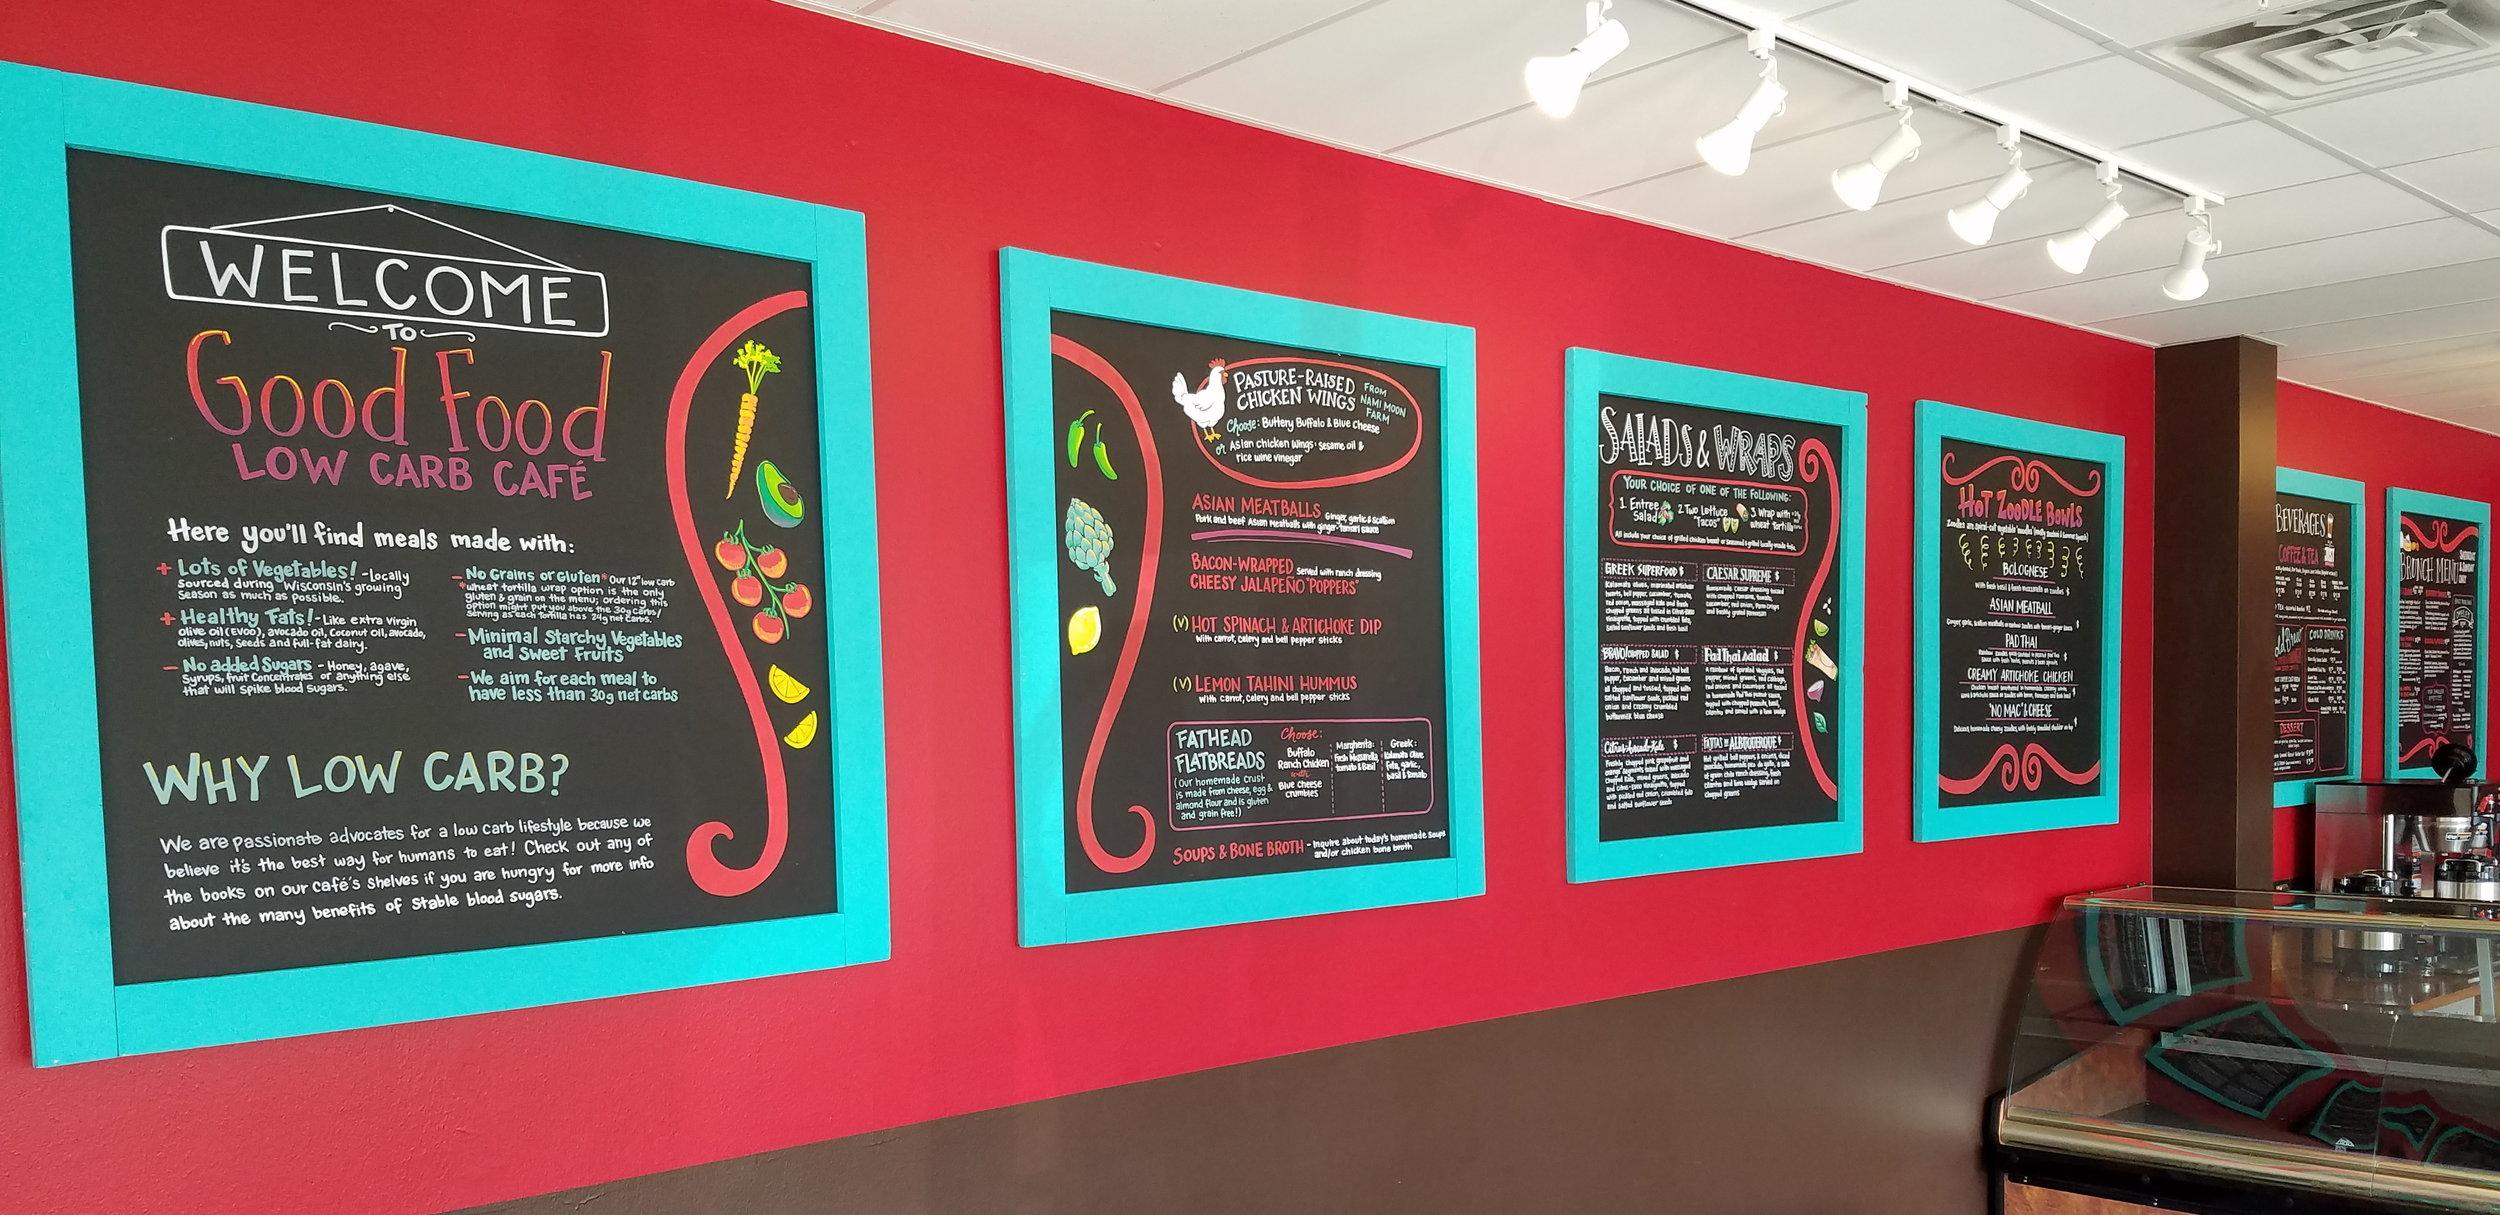 Good Food Low Carb Cafe Chalkboard Menus